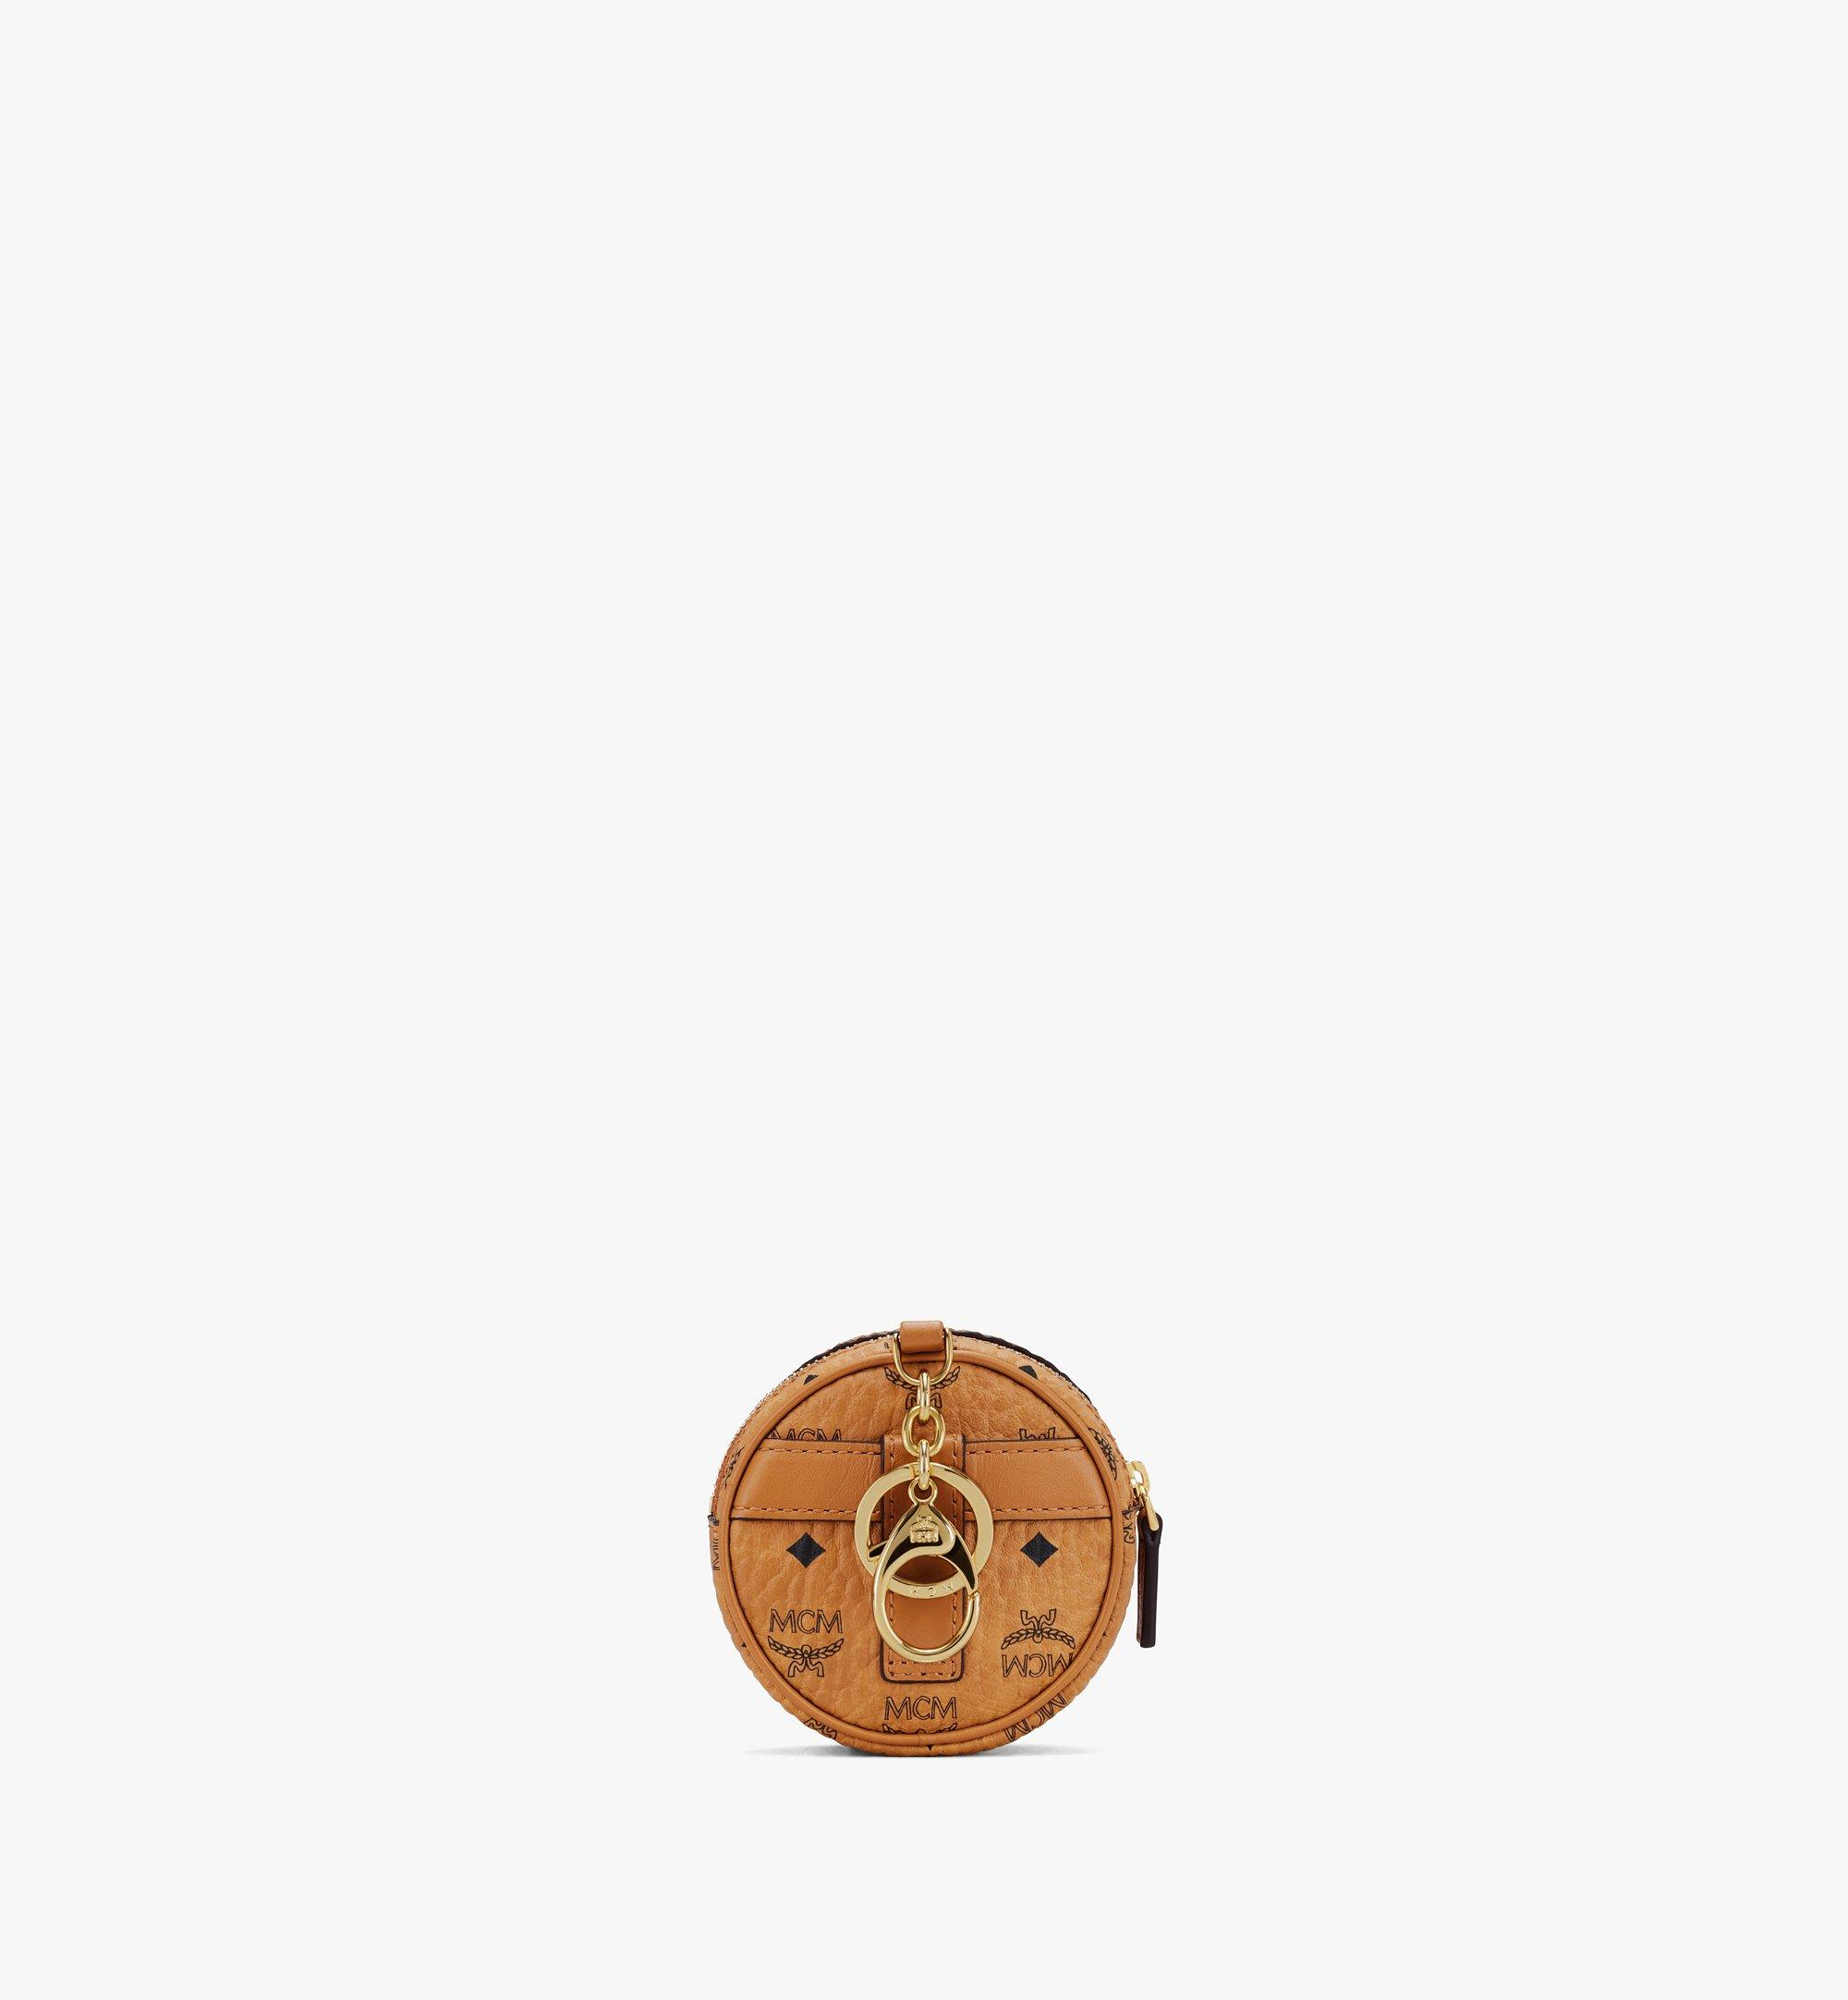 MCM Tambourine Charm with Crossbody Strap in Visetos Cognac MXZASVI03CO001 Alternate View 2